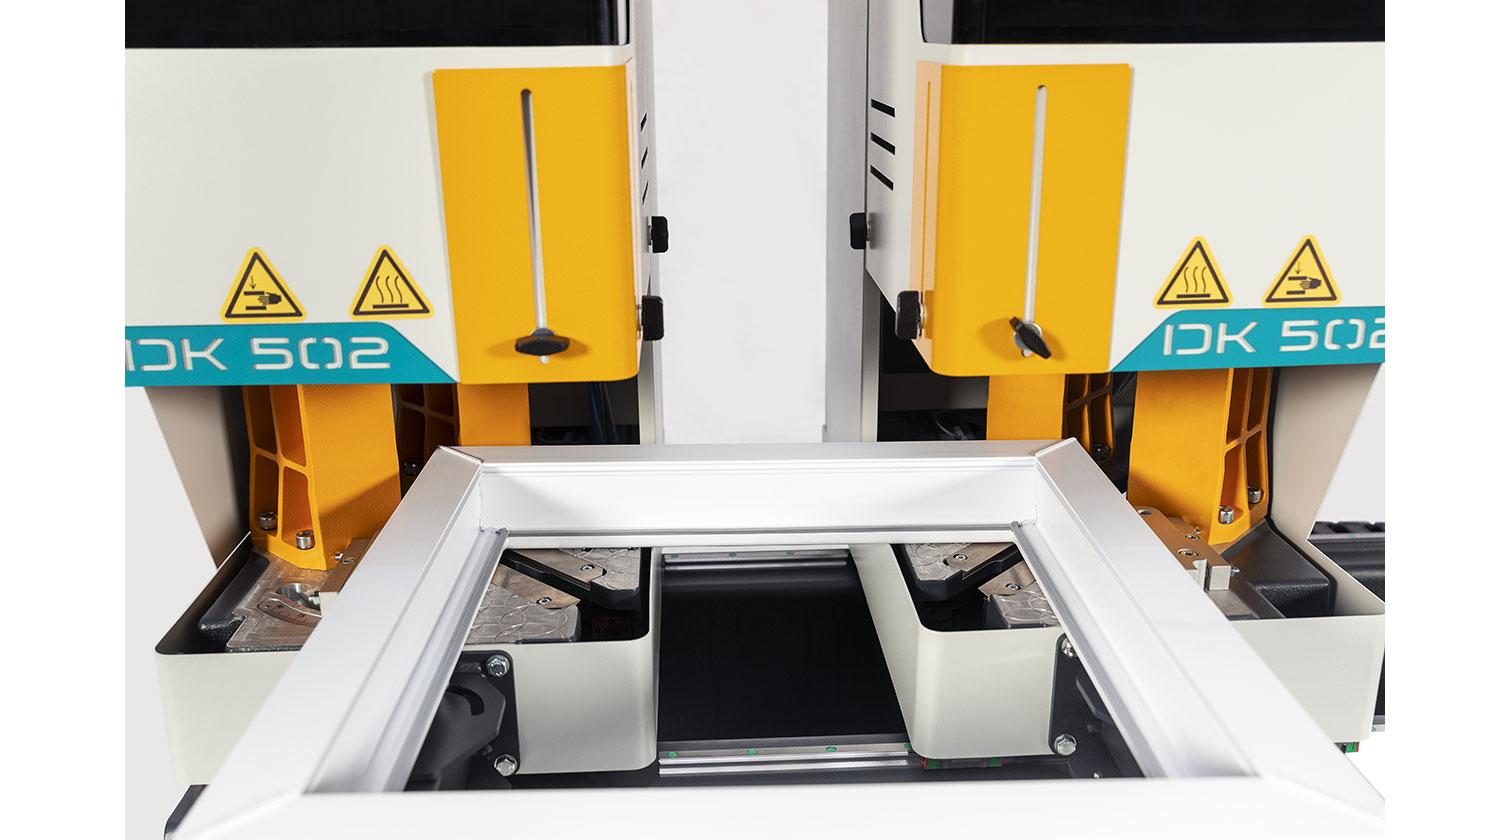 INT pvc windows two point welder Yilmaz DK 502 with frame